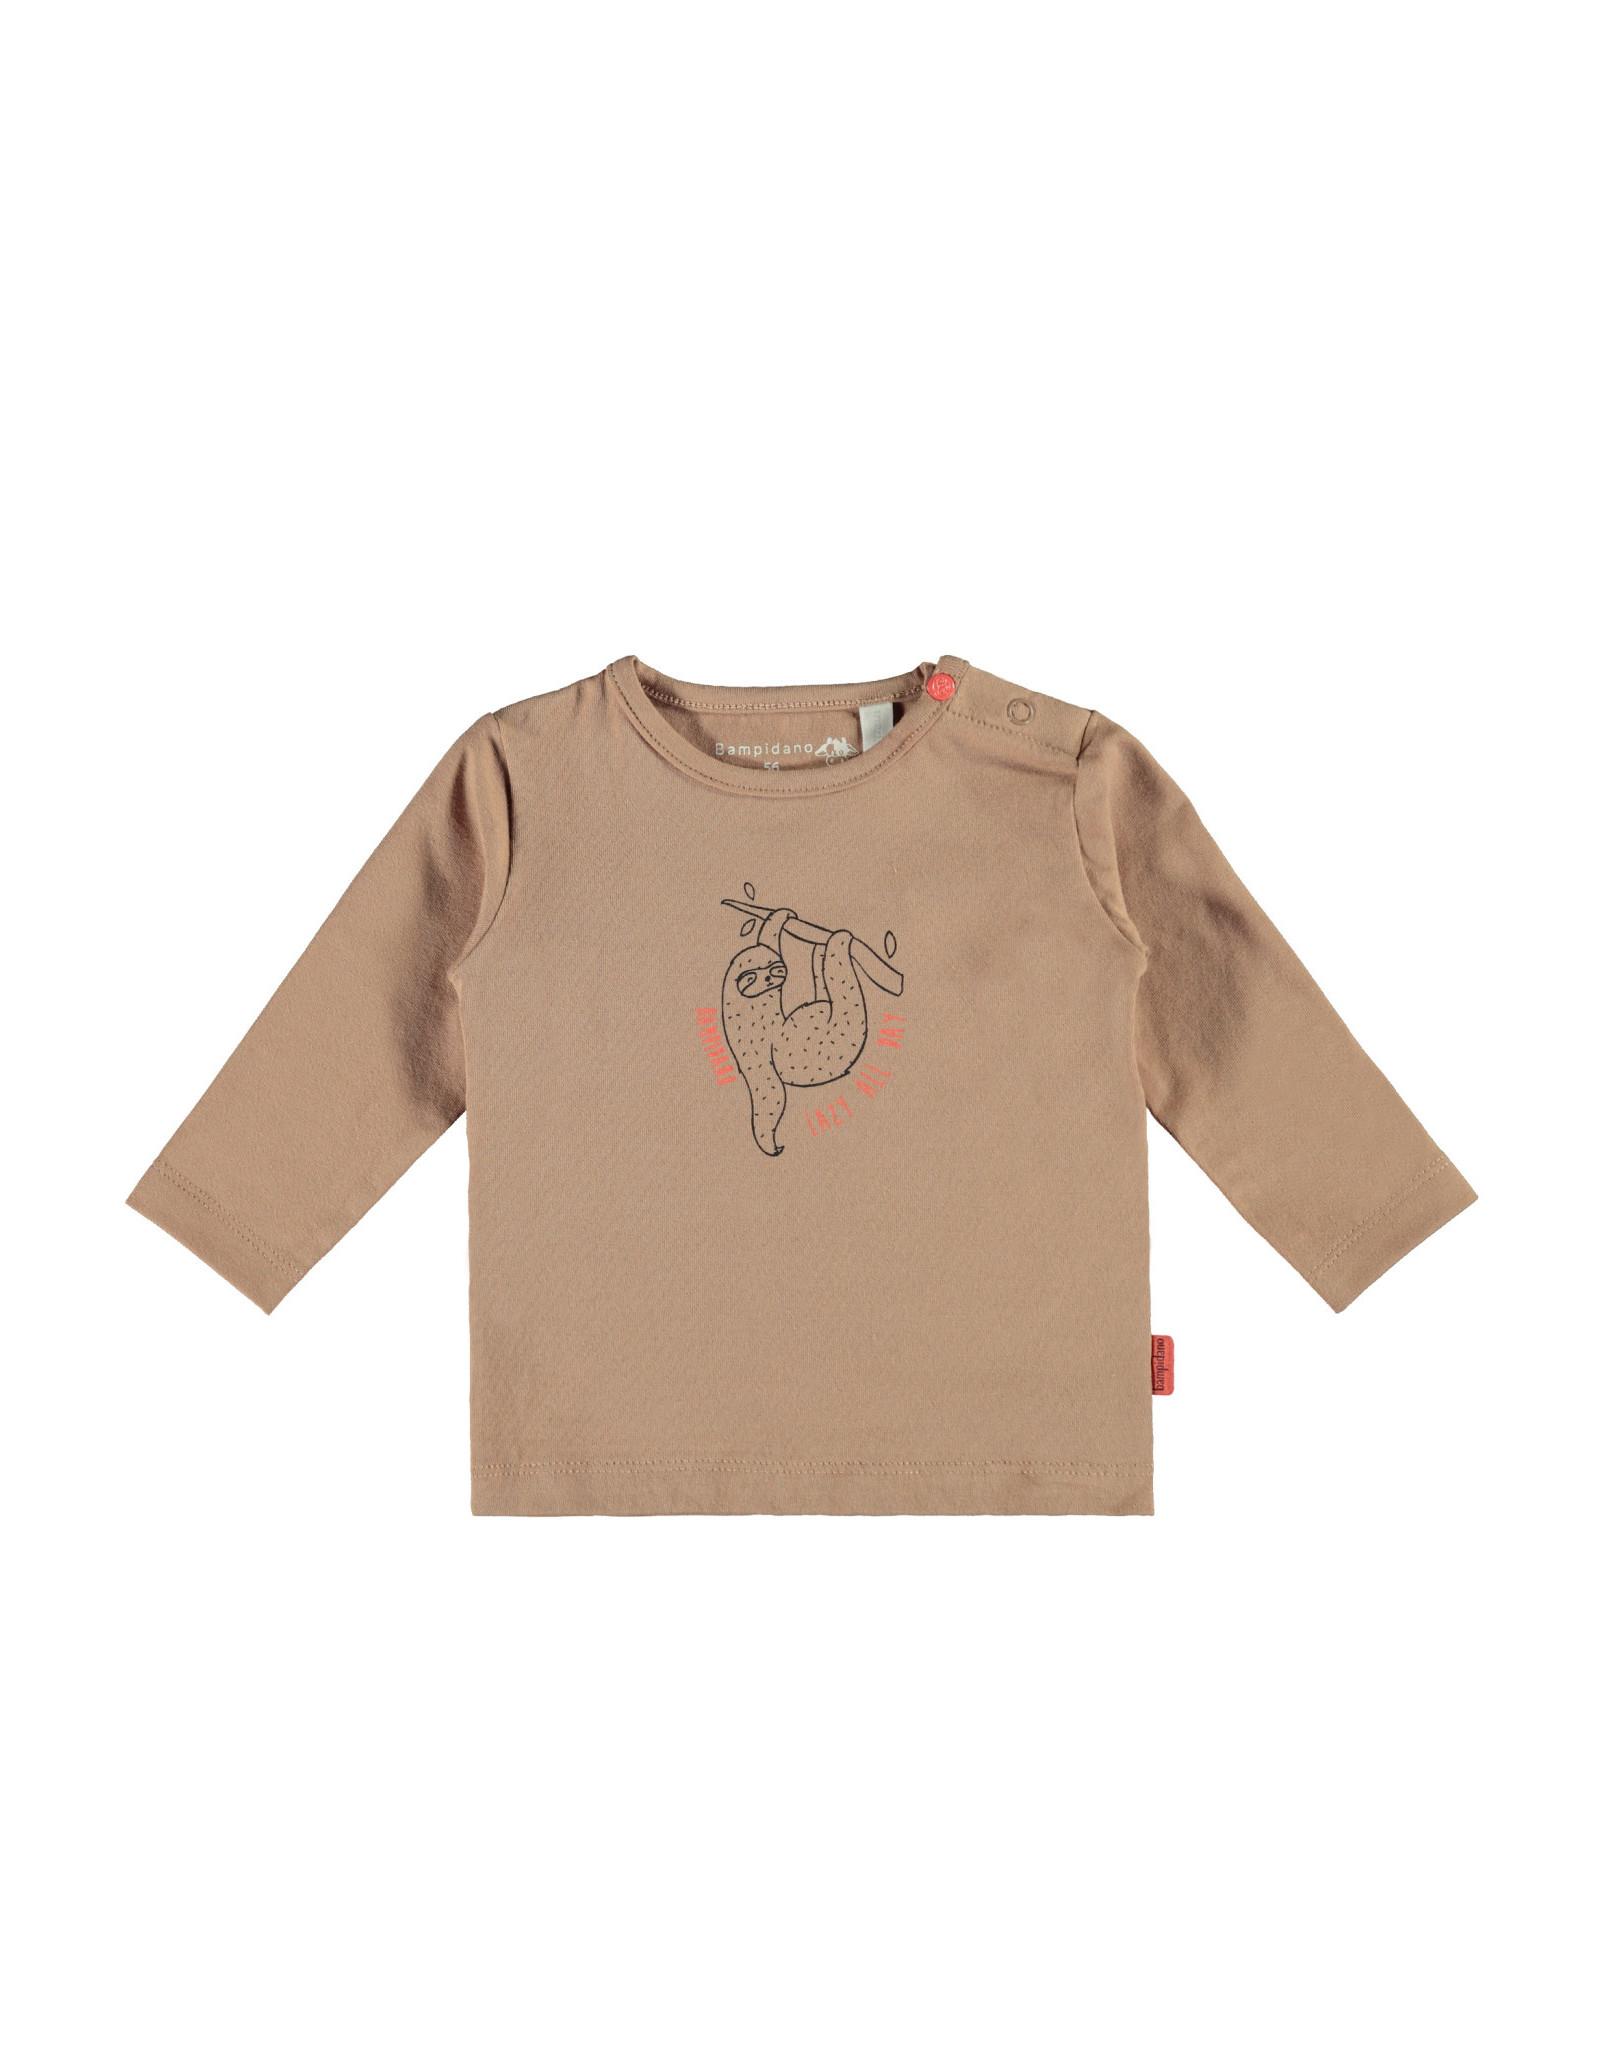 Bampidano Bampidano newborn shirt Fynn print Sloth Sand